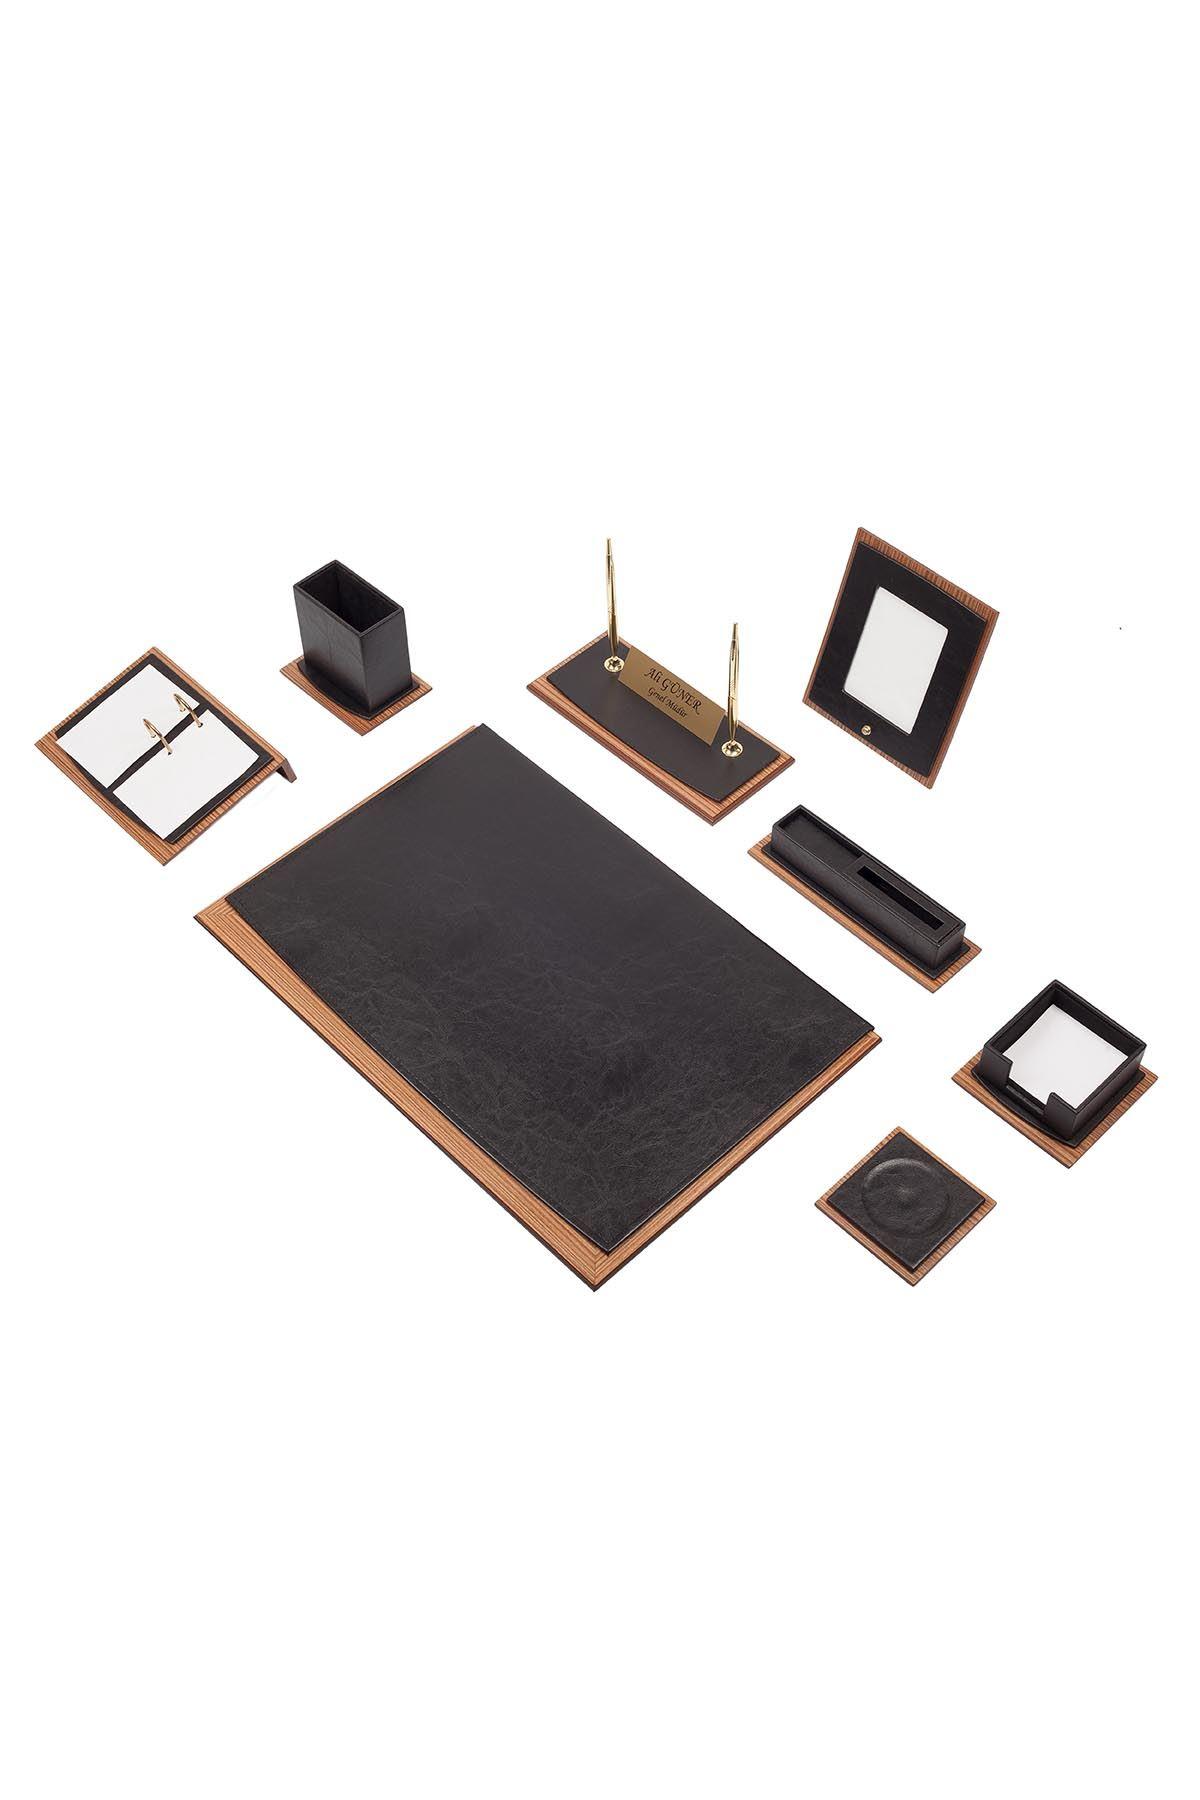 Star Lux Leather Desk Set Black 10 Accessories